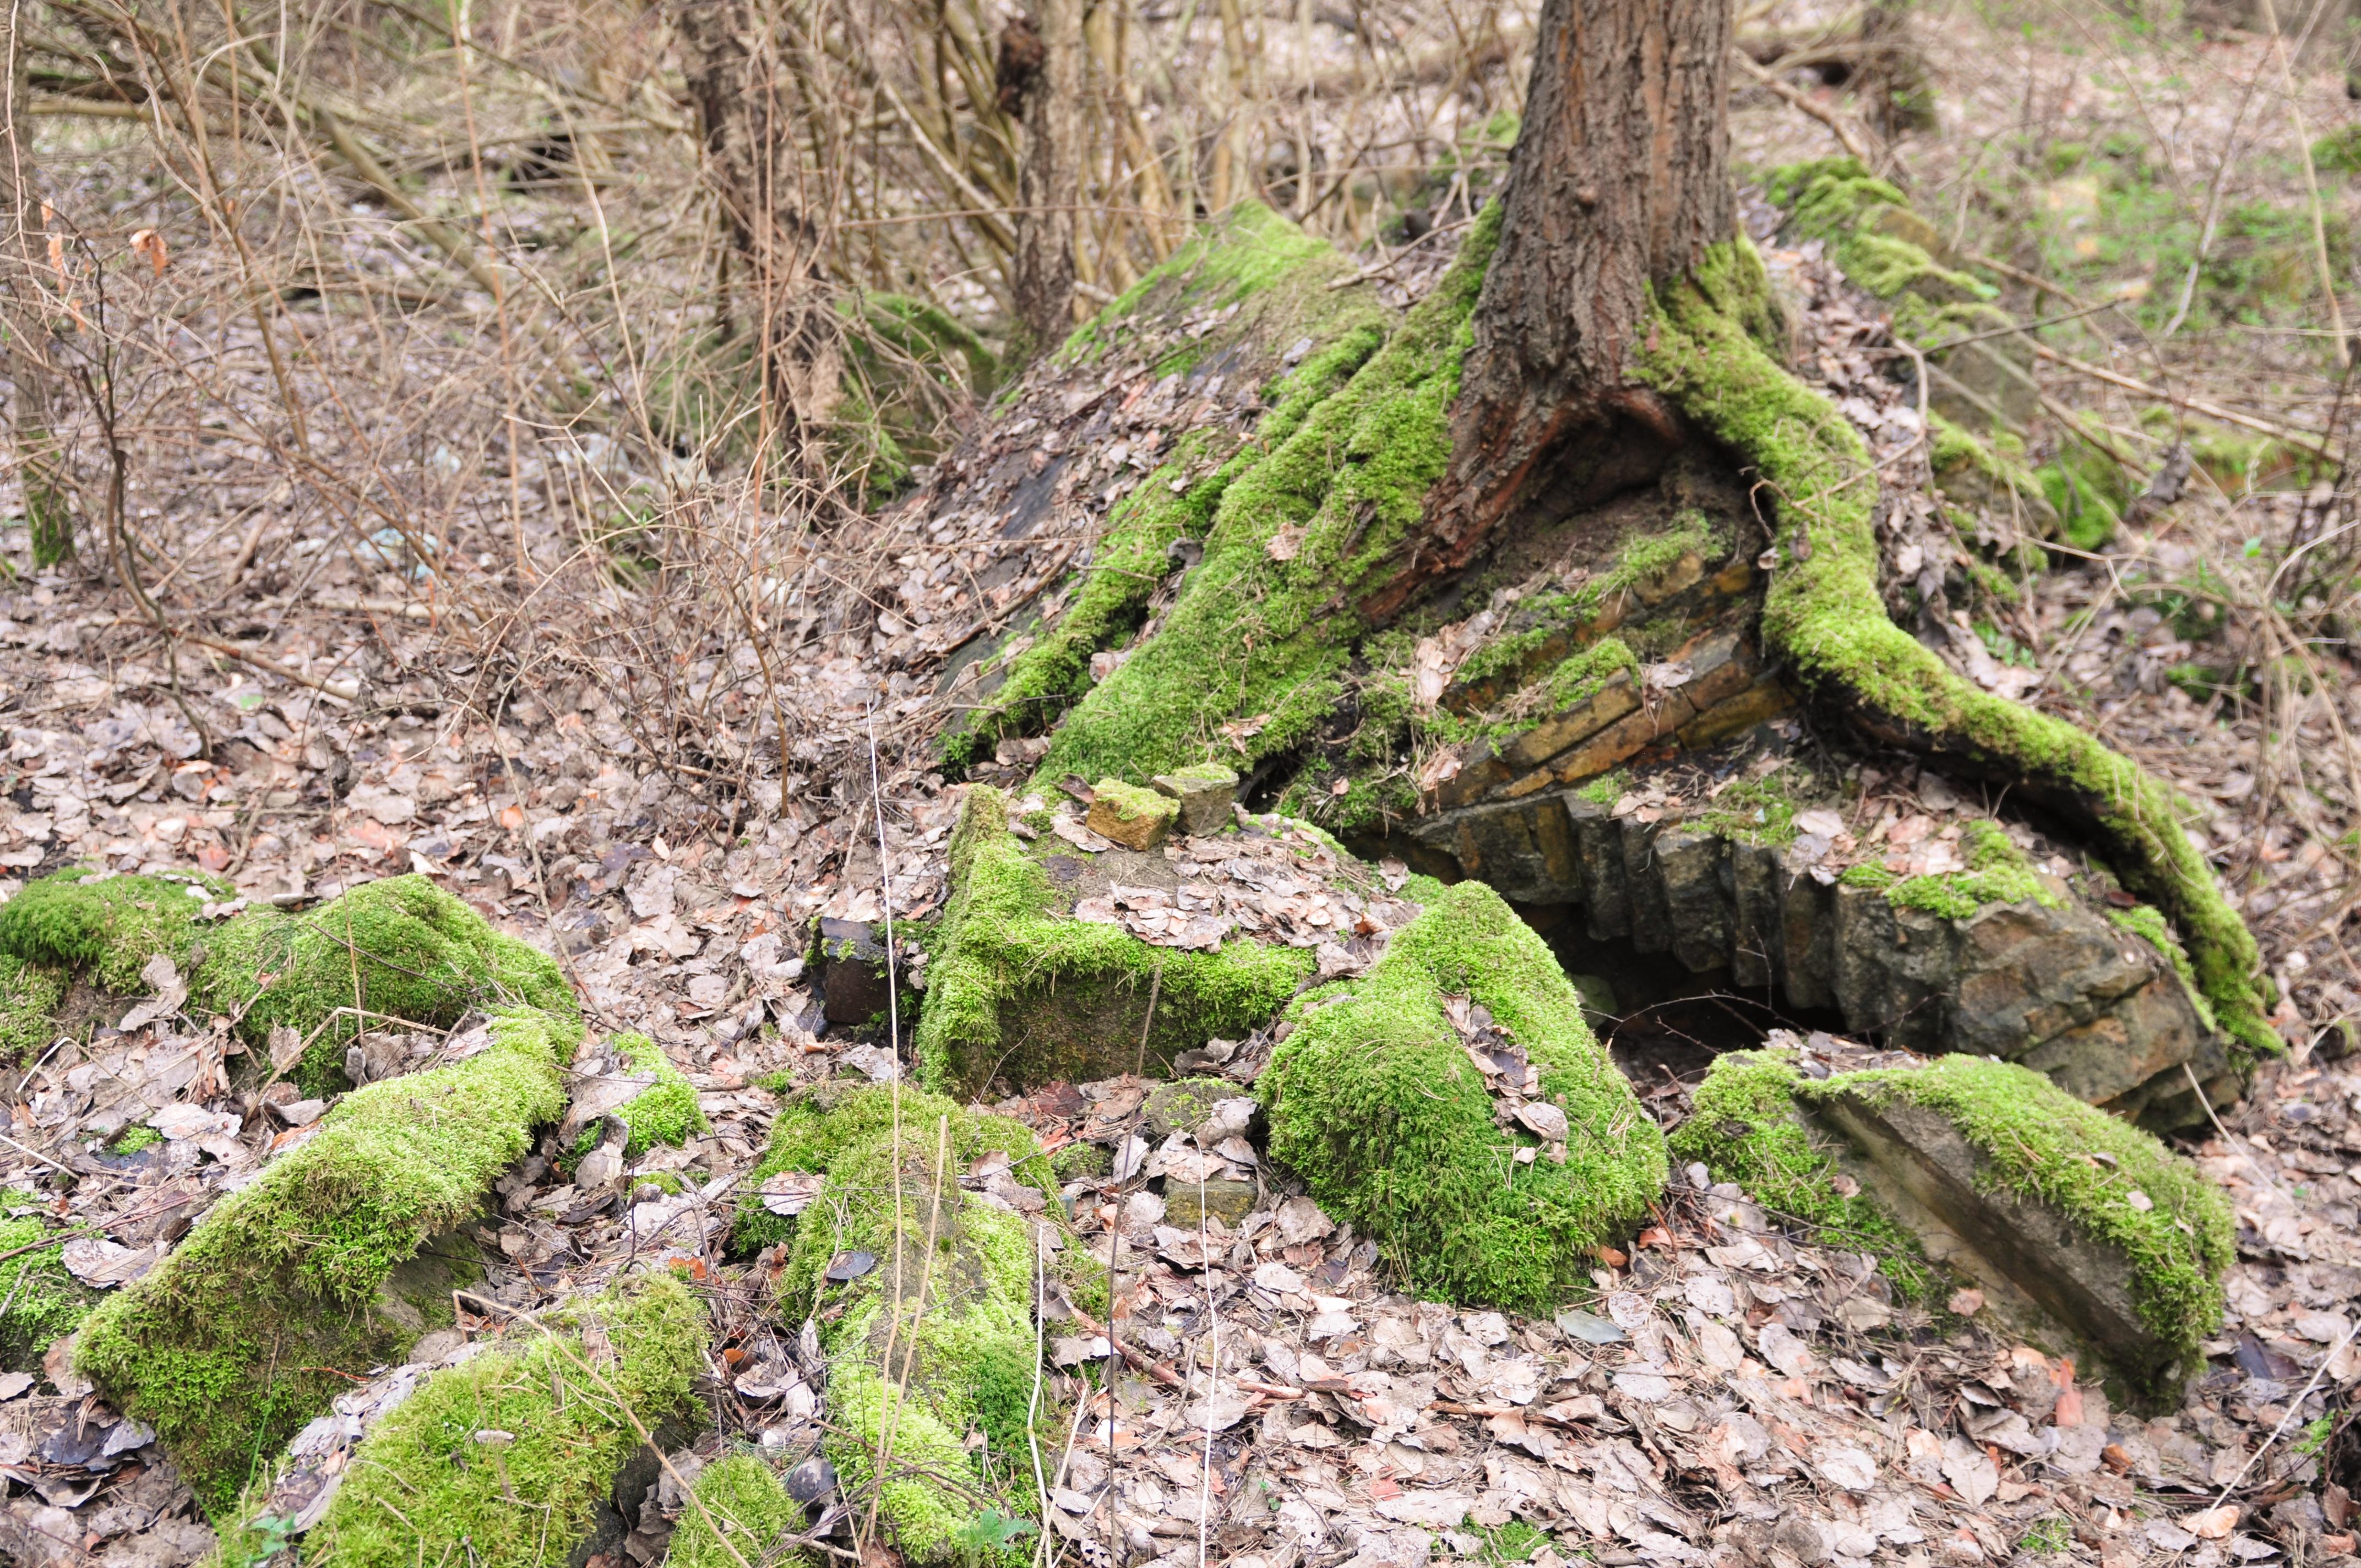 14-04-07-franzosenbunker-eberswalde-03.jpg